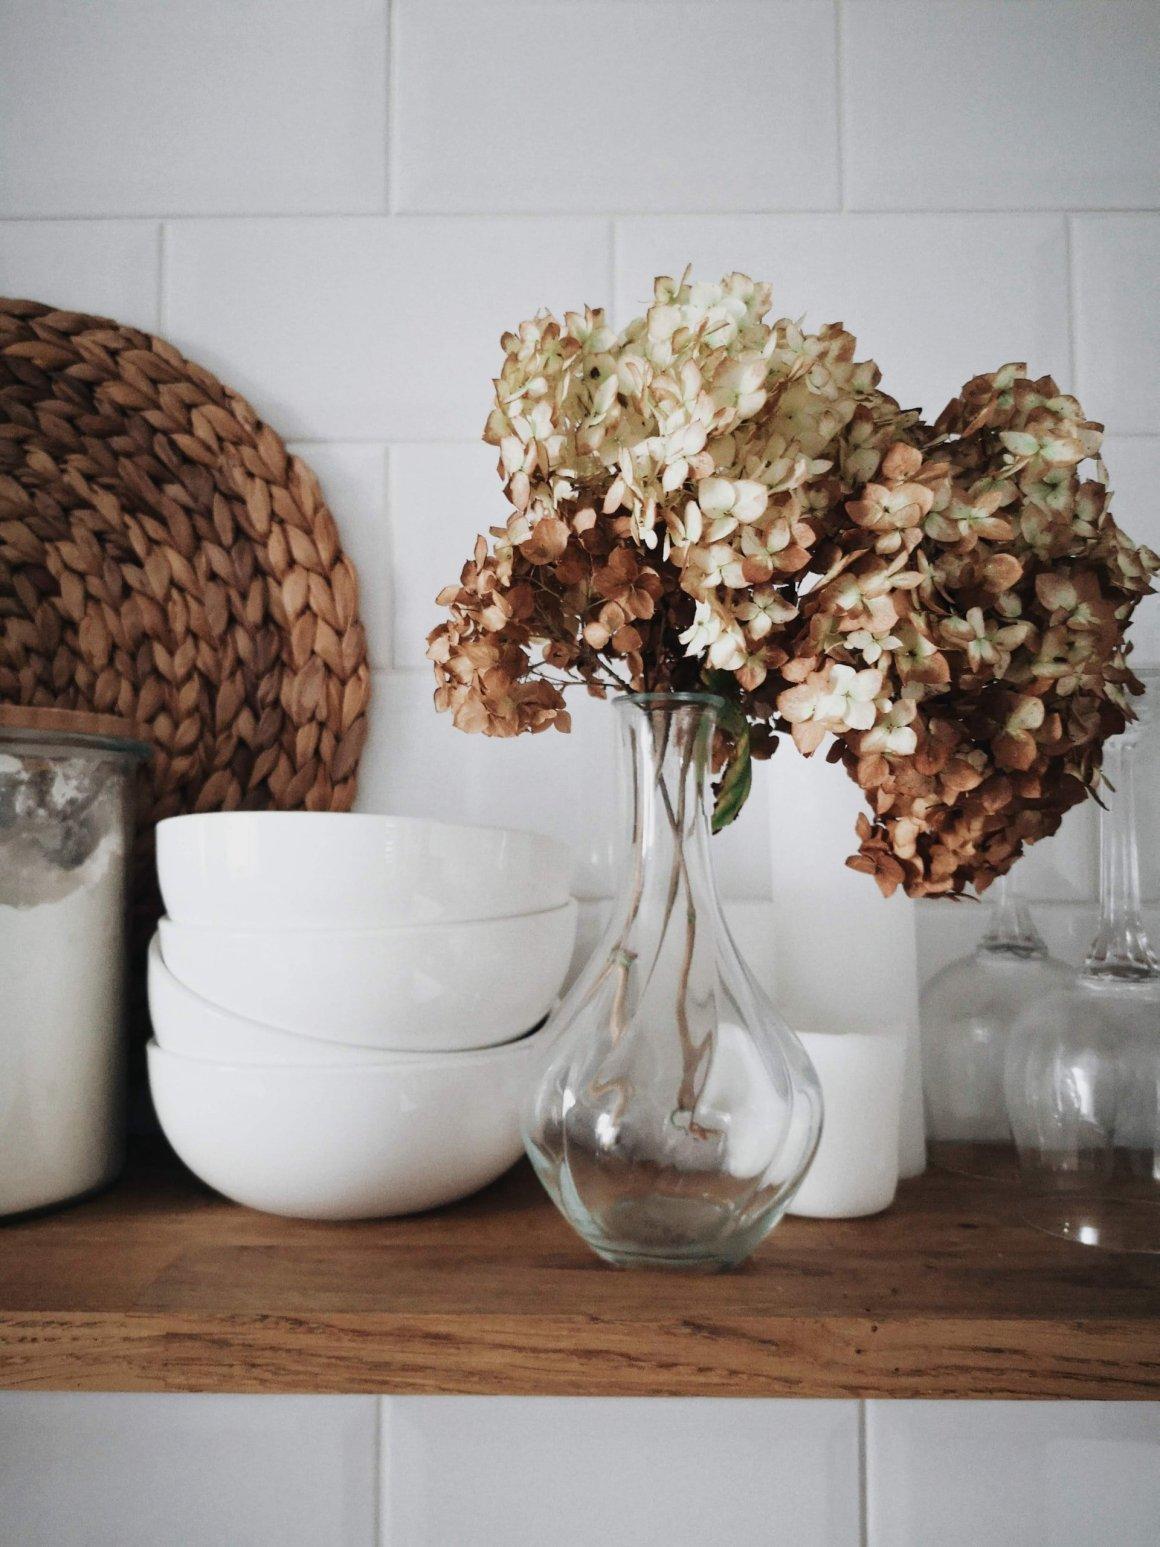 bohemian decor trend - dried flowers